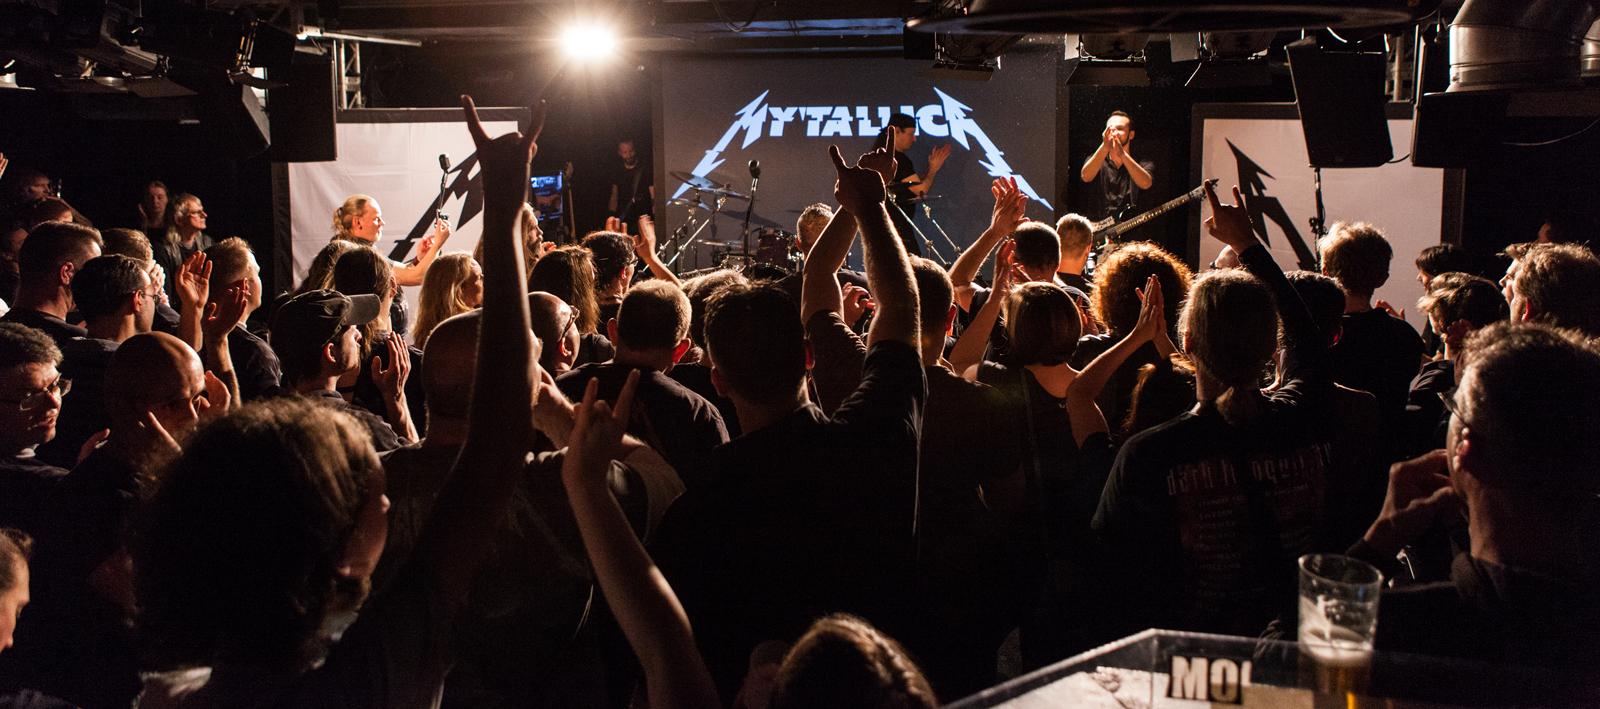 mytallica-wuppertal-live-club-barmen-2018-publikum-besucher-lcb